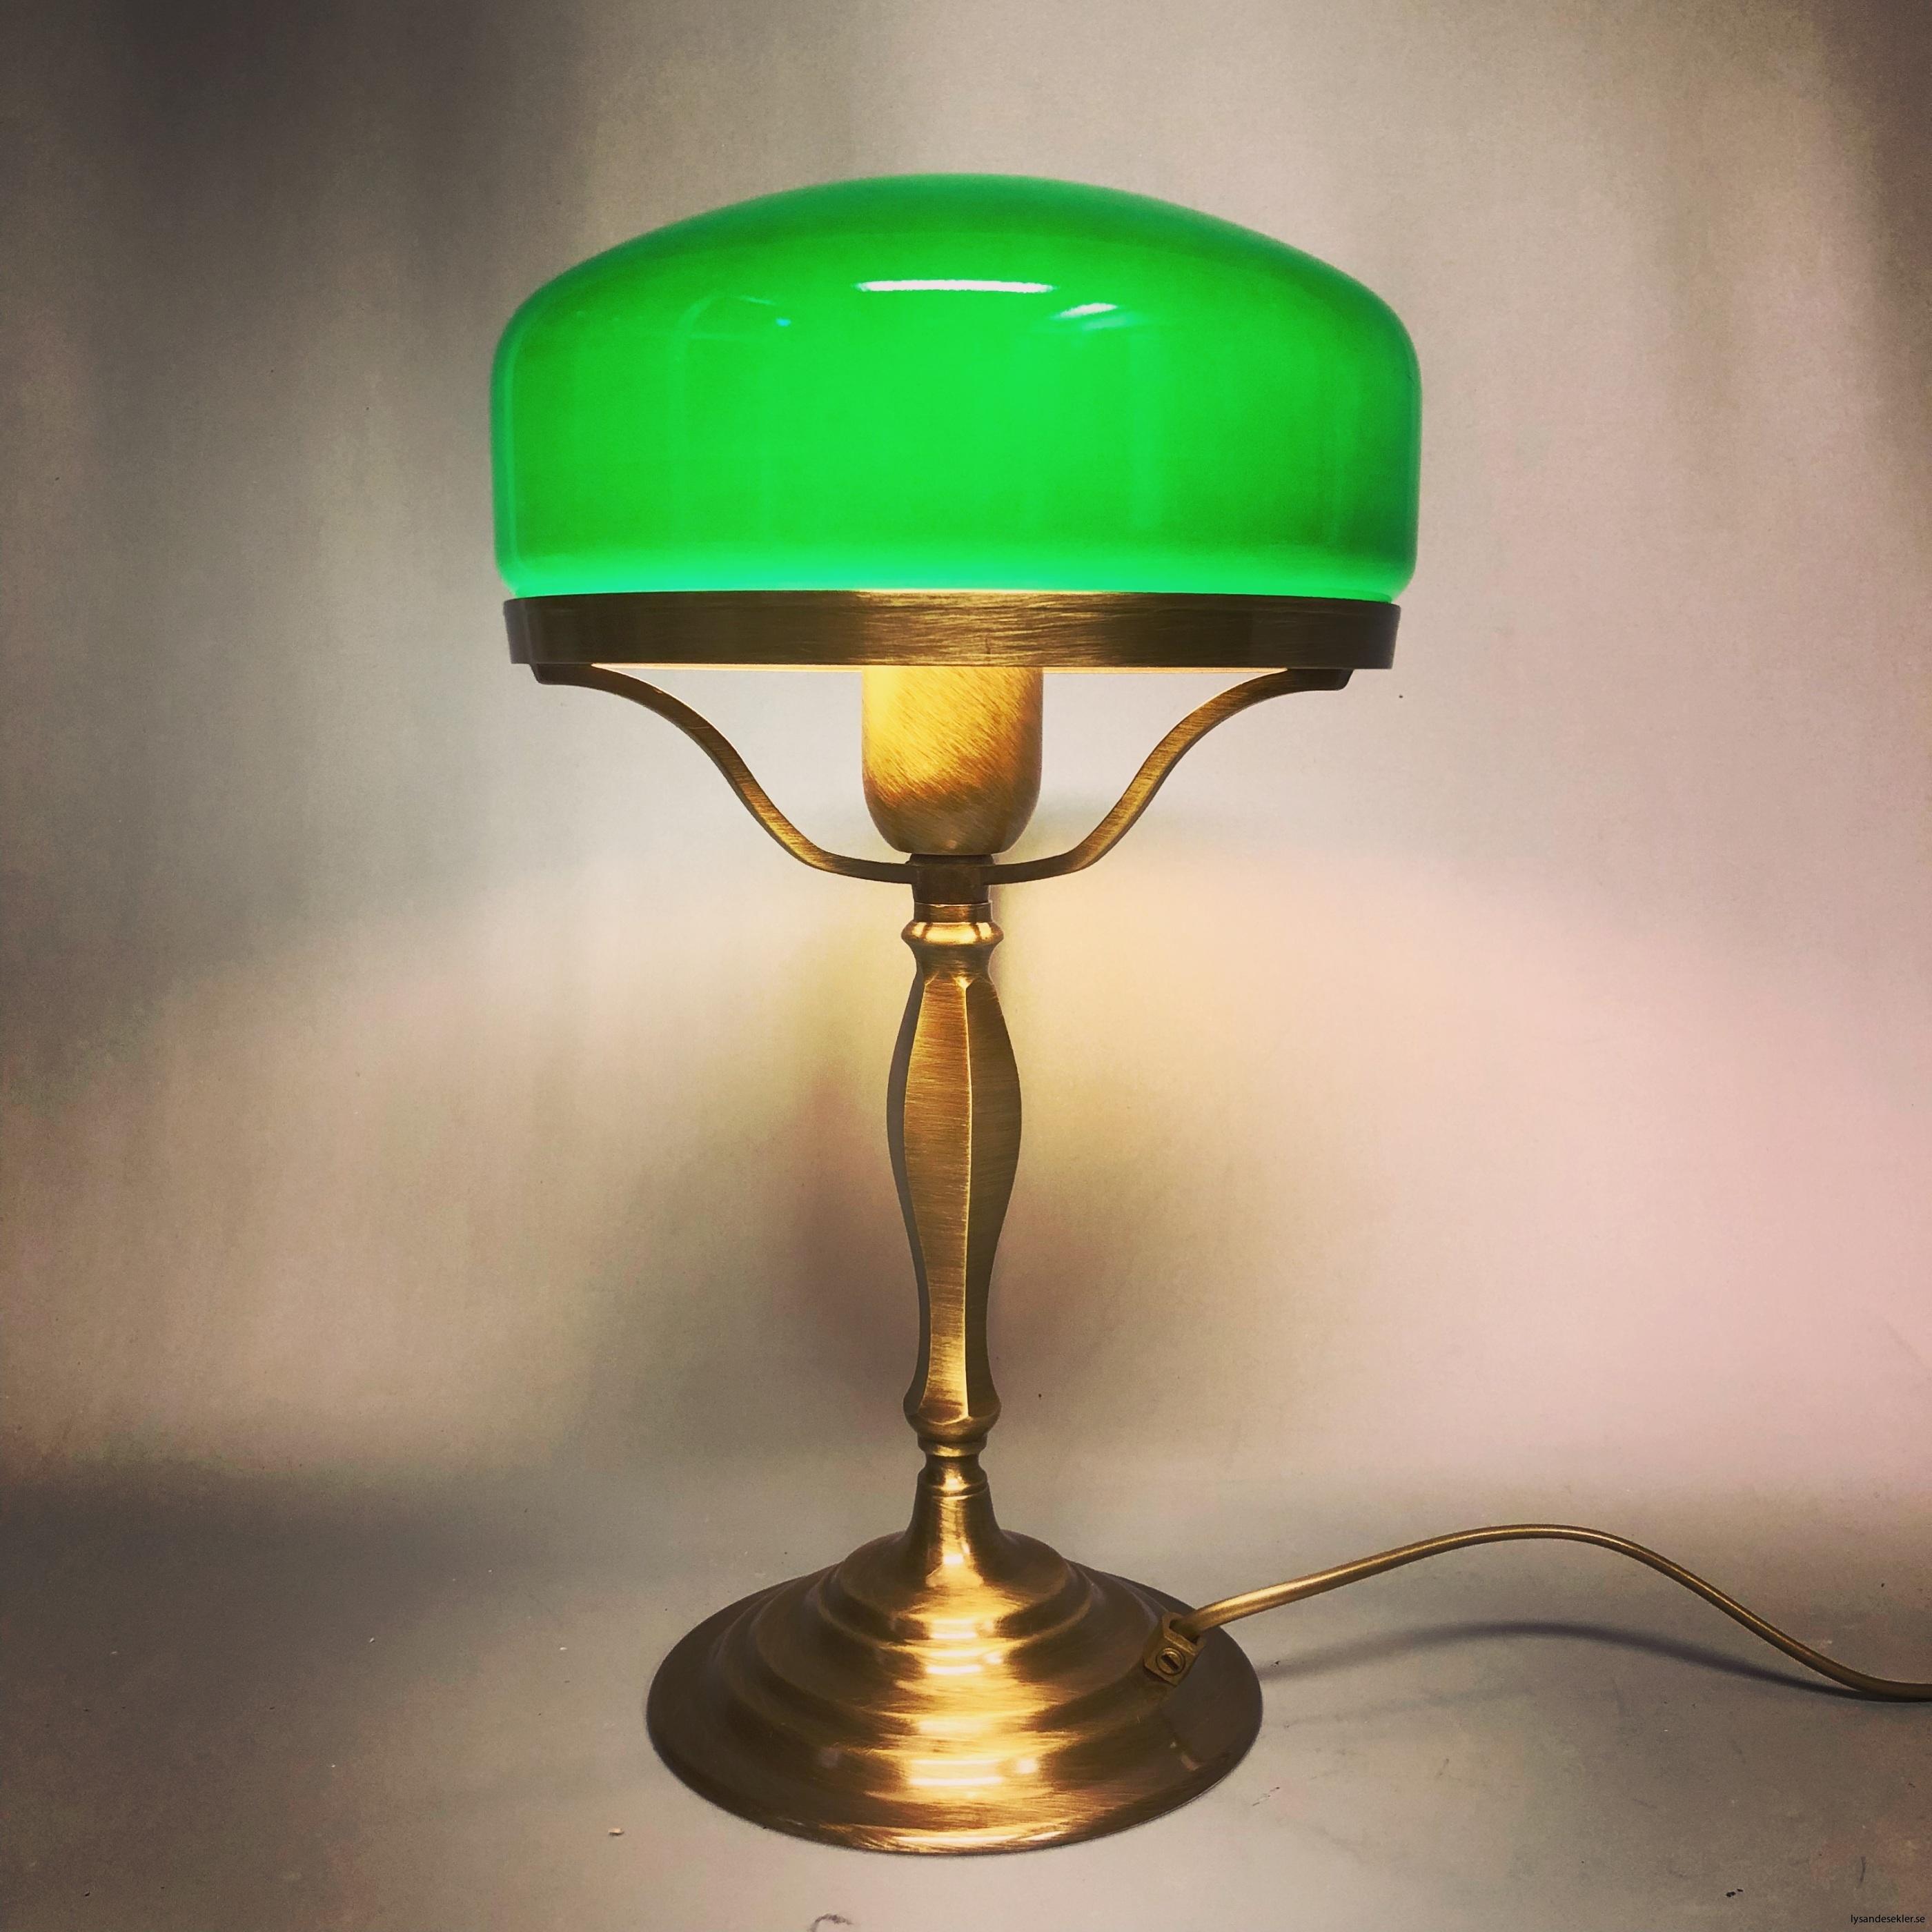 strindbergslampa strindbergslampor strindberg lampa skärm kupa strindbergsskärm strindbergskupa31